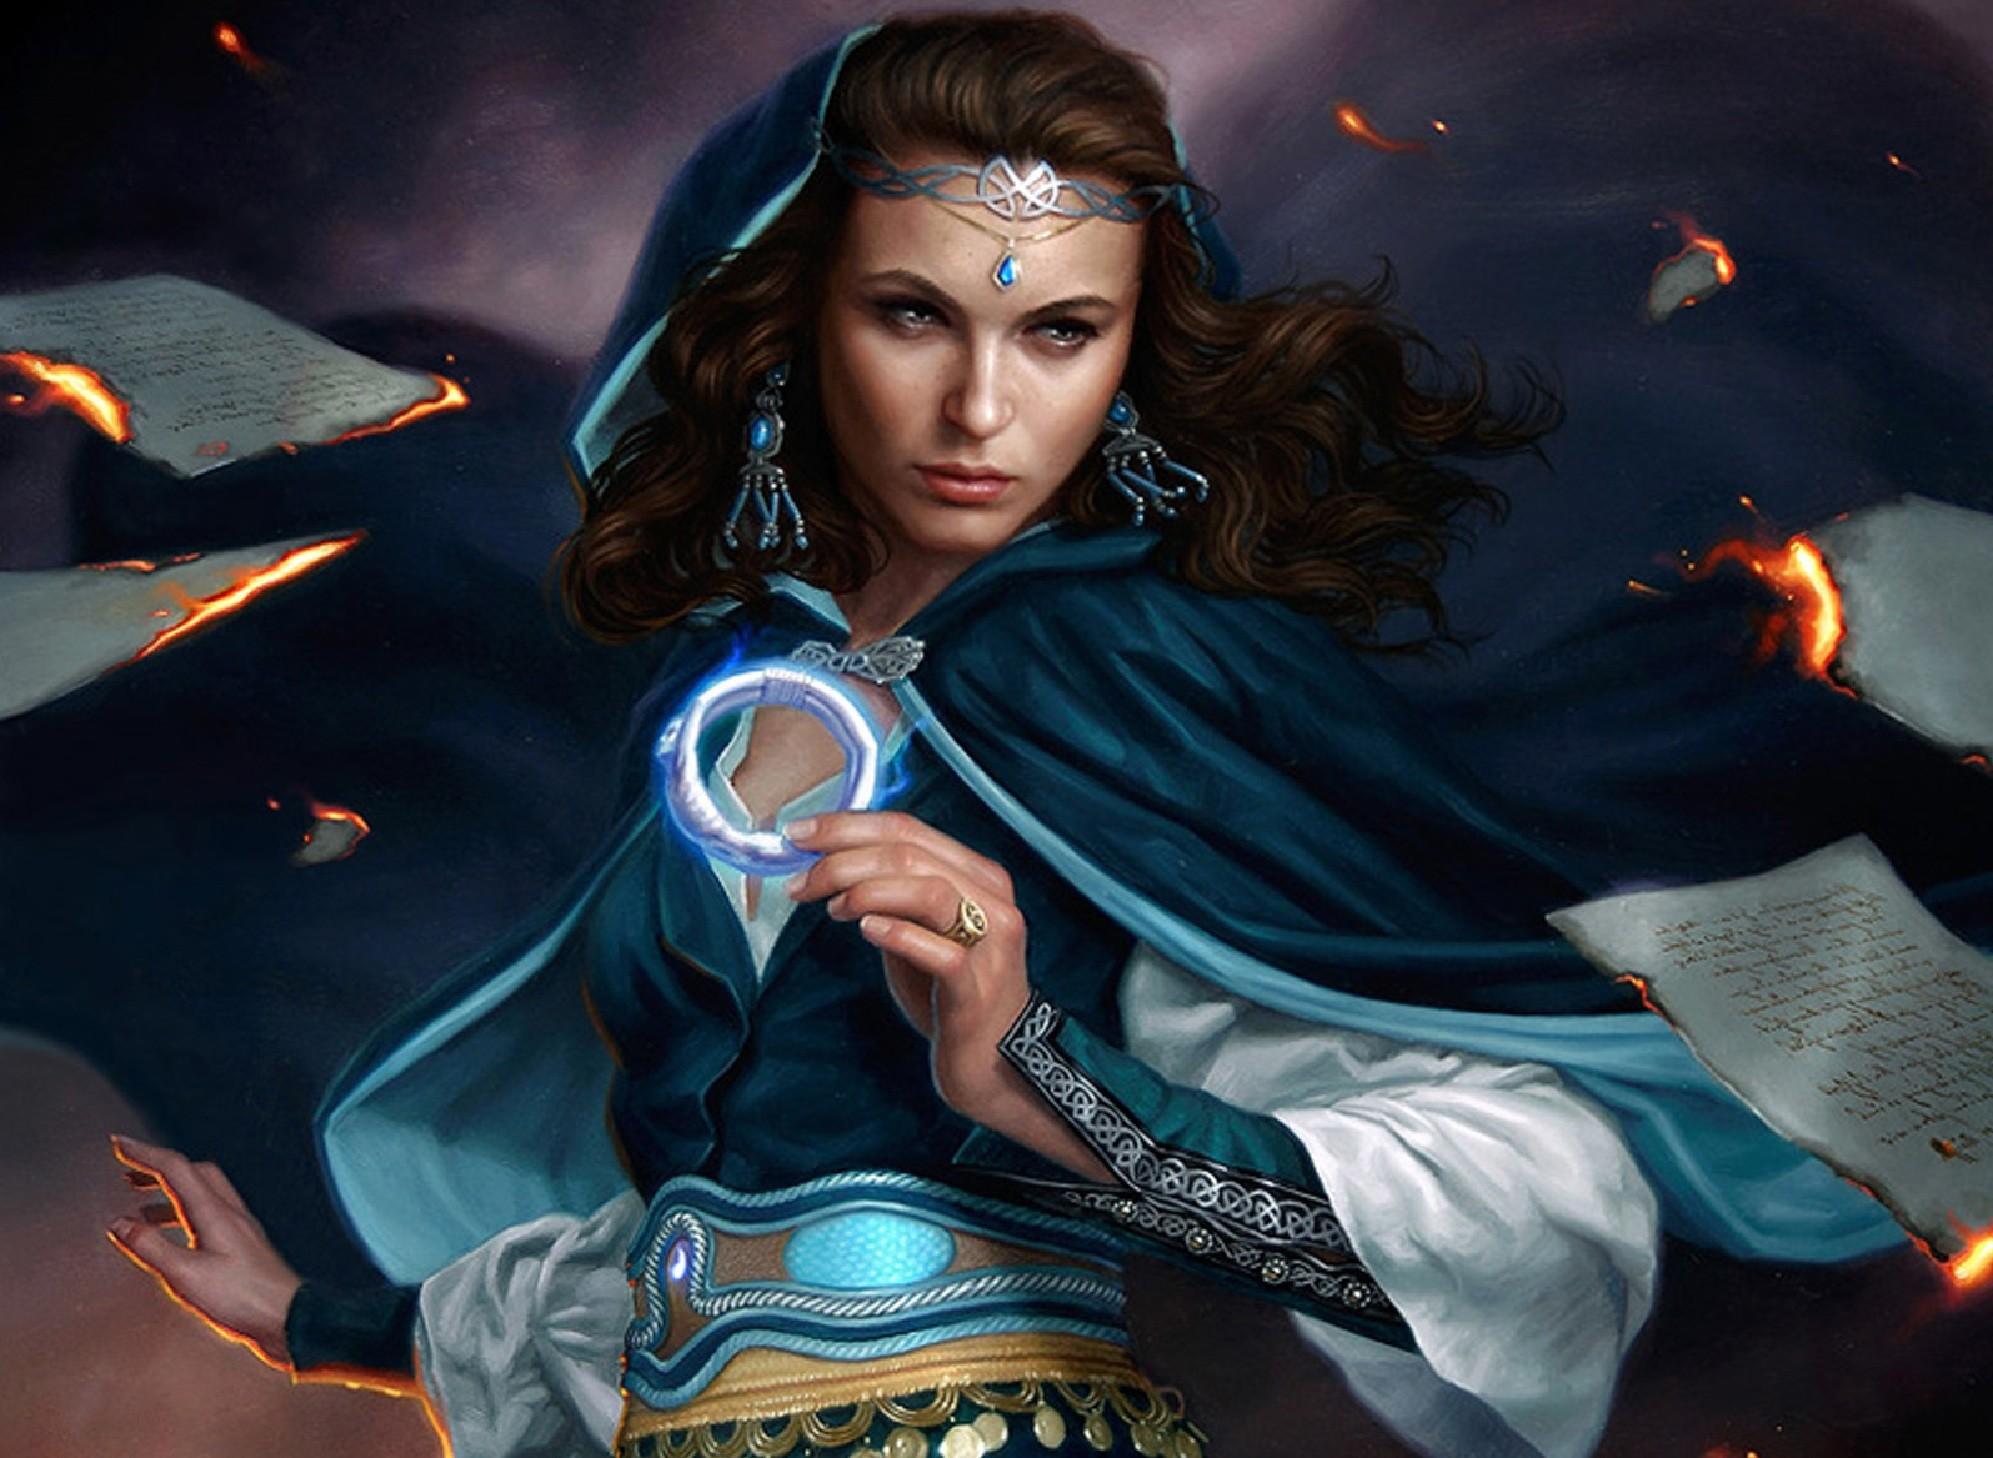 Fantasy Woman Wallpaper | Fantasy Women Wallpaper/Background 1993 x 1458 –  Id: 140617